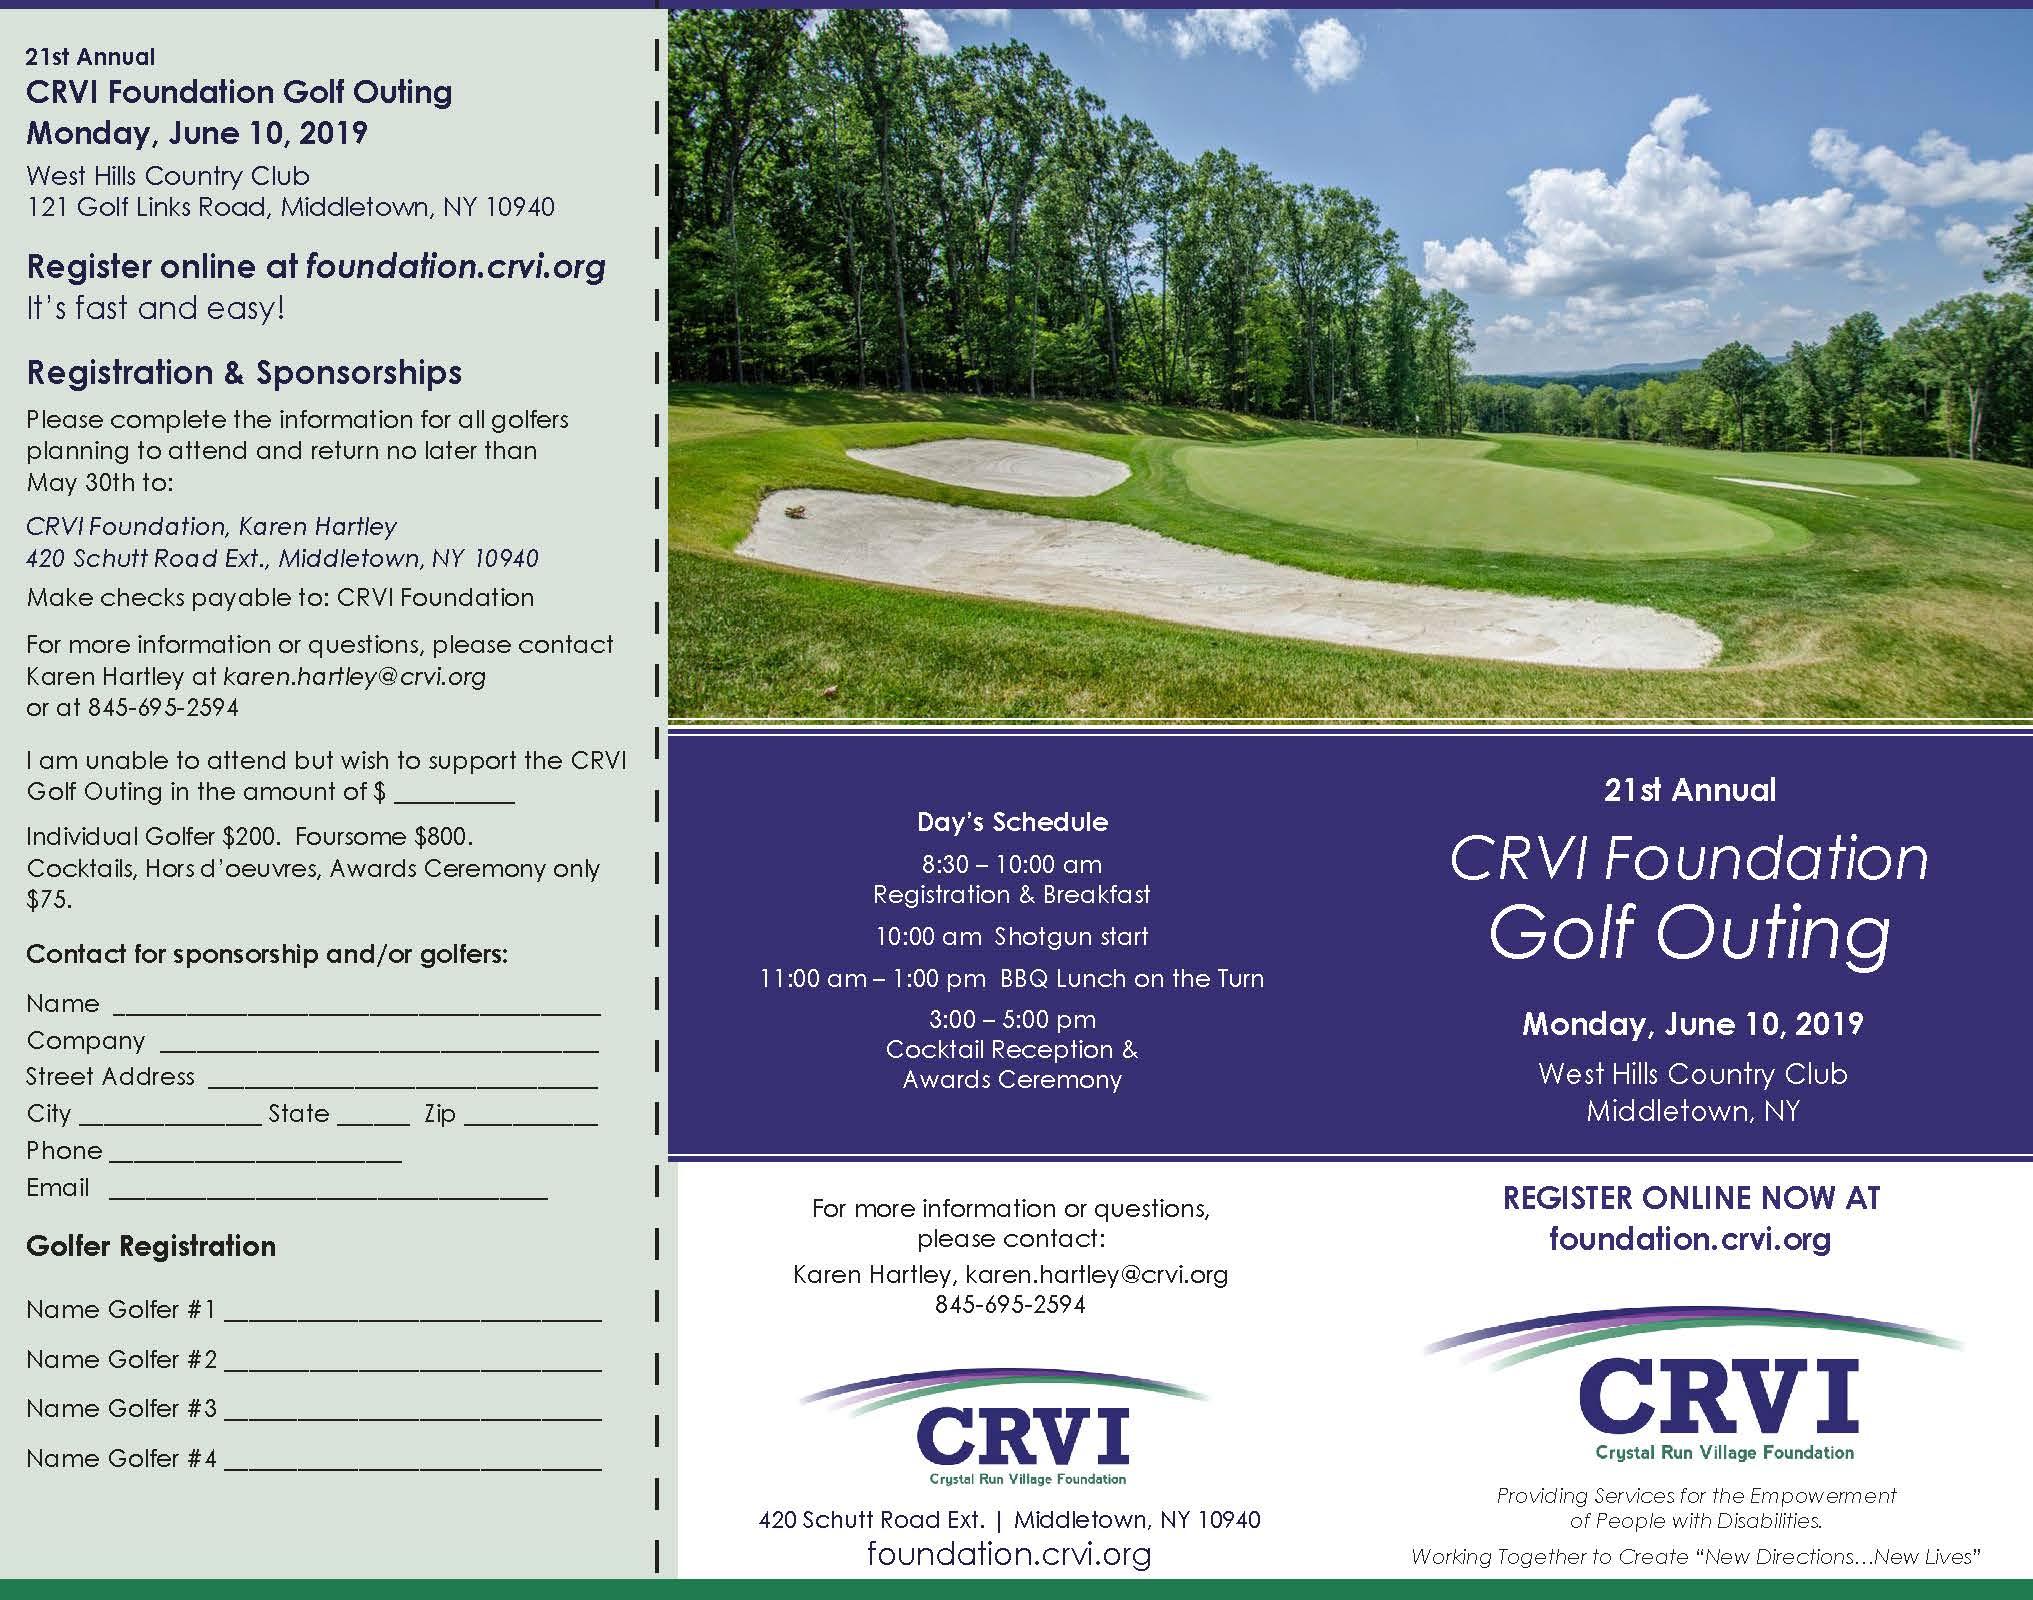 CRVI : Foundation : CRVI Foundation Golf Outing 2019